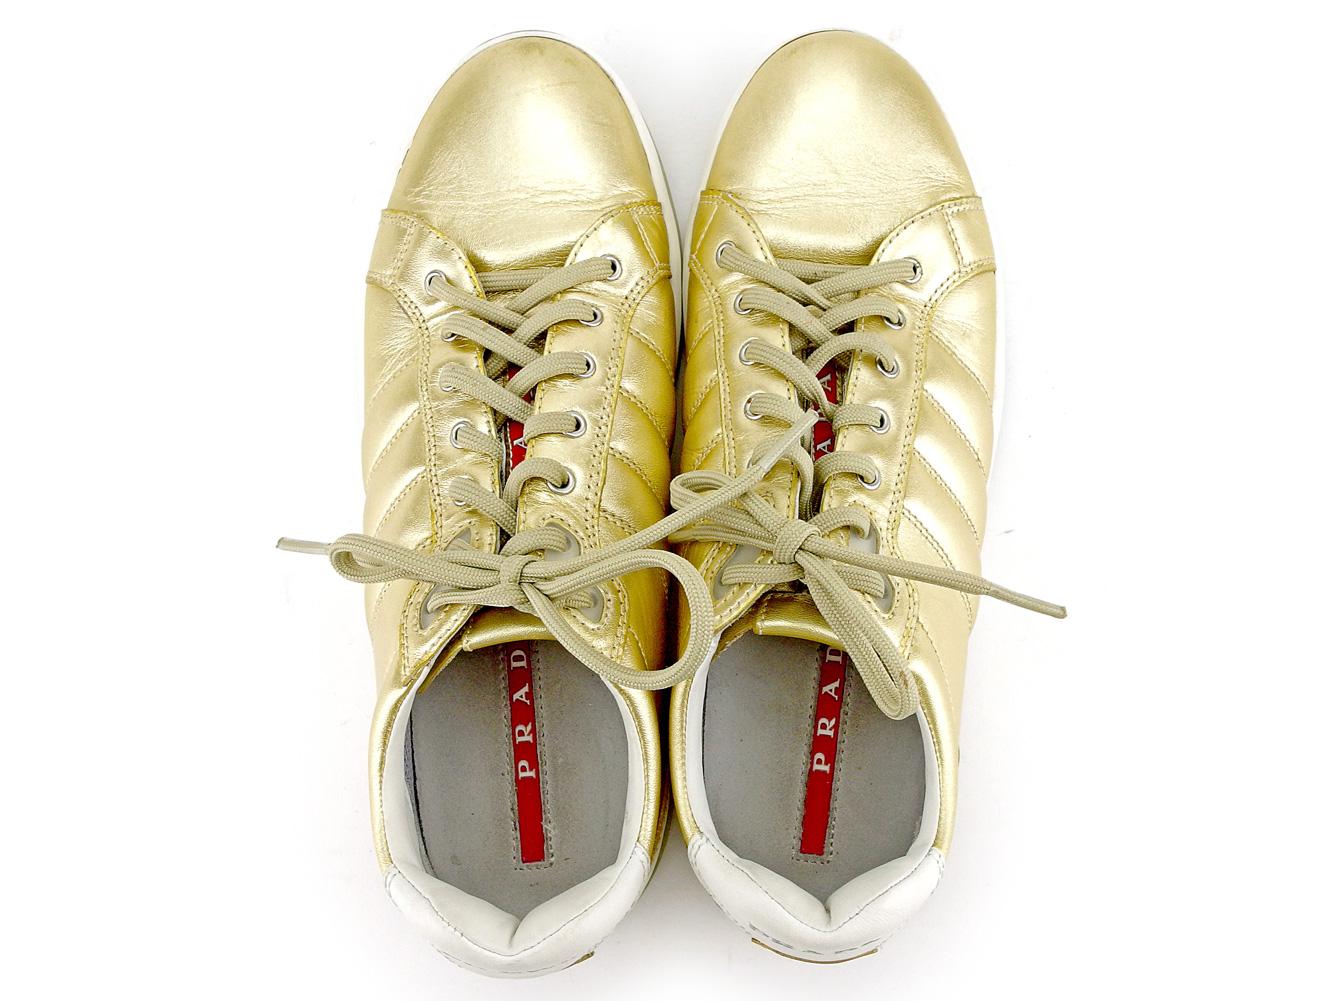 cda176ffce112 ... Prada PRADA sneakers shoes shoes Lady's ♯ 37.5 low-frequency cut sports  Rhein Gold white ...